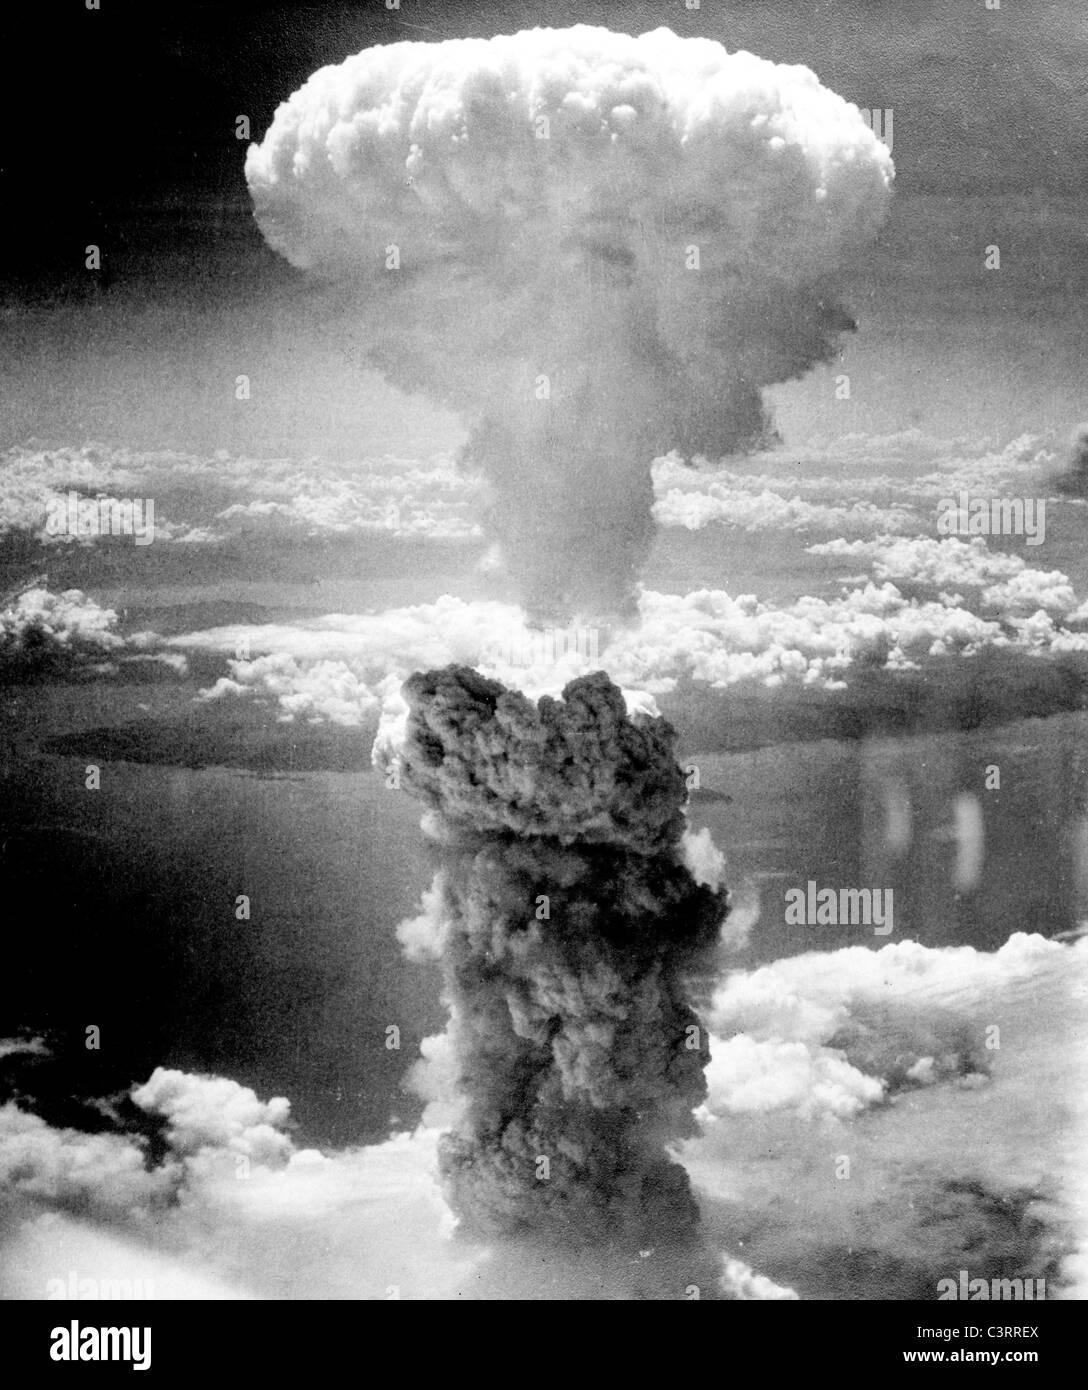 Atombombenabwurfs auf Nagasaki am 9. August 1945. Stockbild